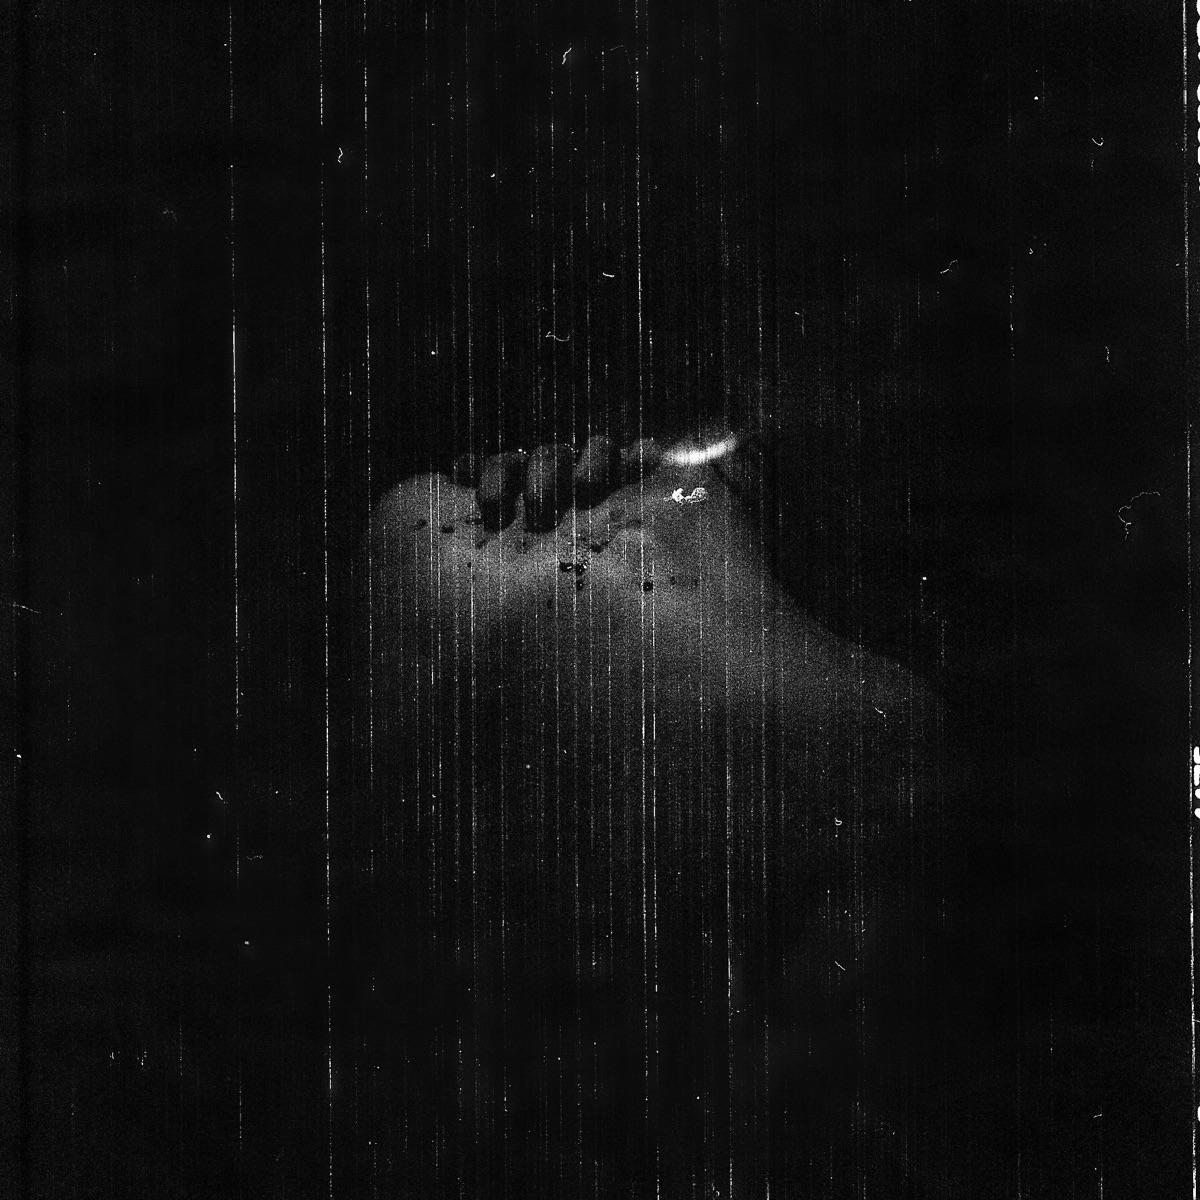 wisteriasuspiria Post 02 Dec 2018 01:14:45 UTC | ello